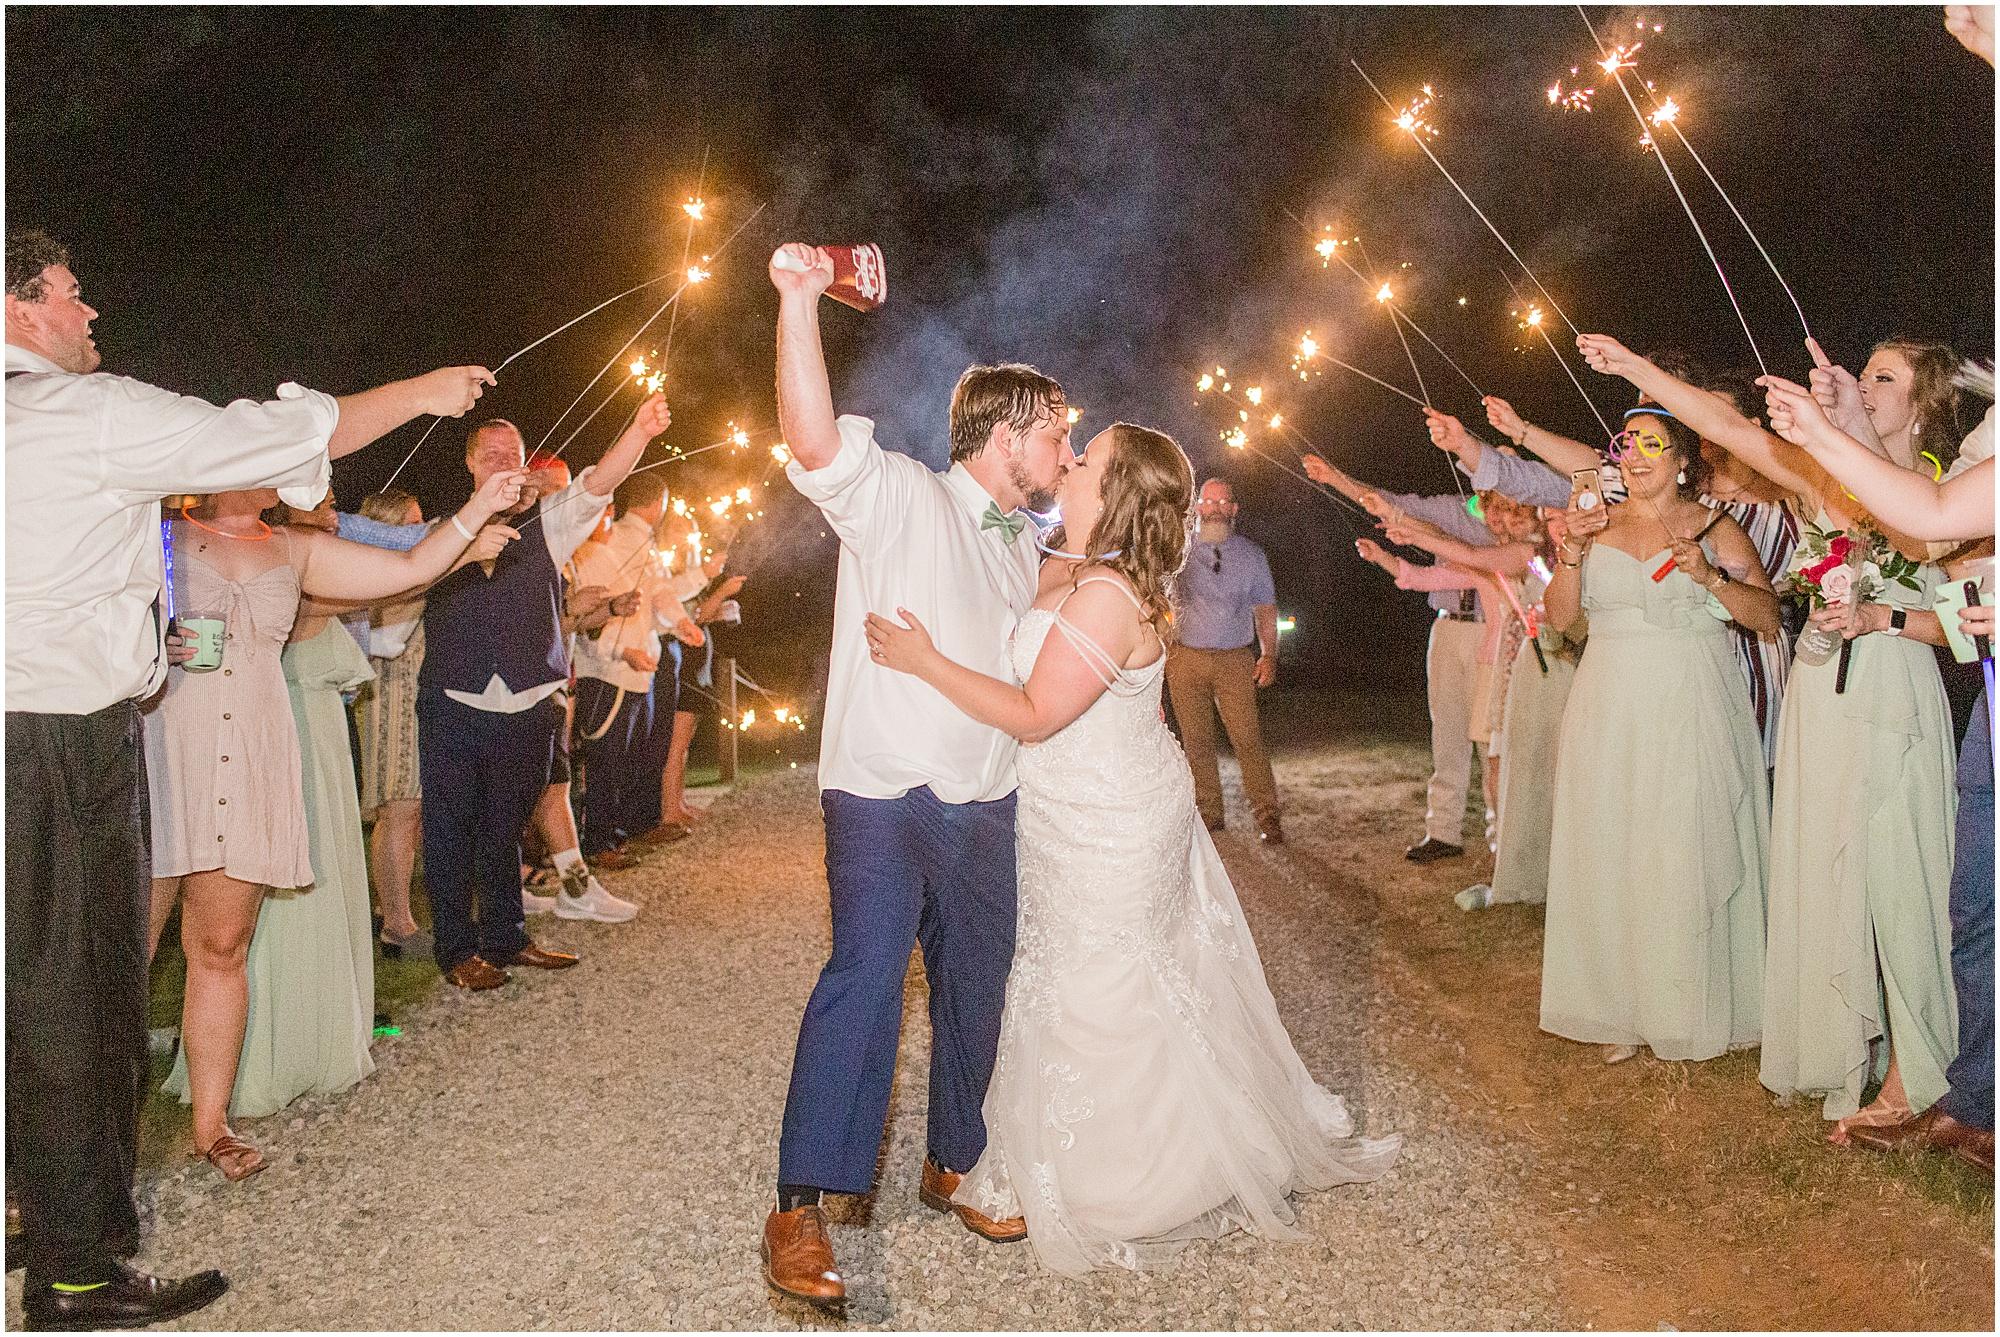 starkville-mississippi-wedding-page-place-dodson-farms_0089.jpg